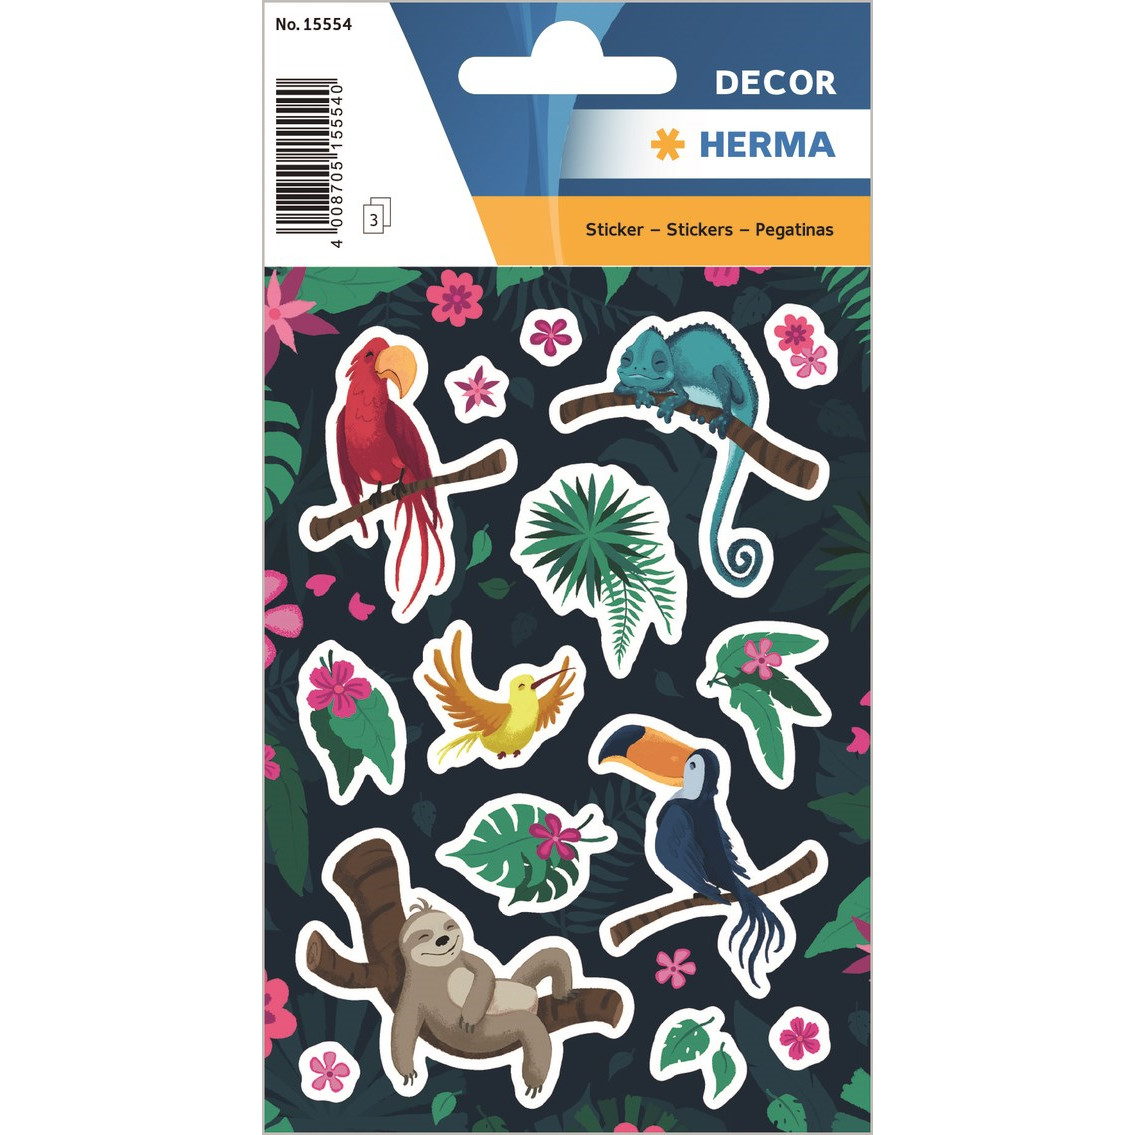 HERMA Herma stickers Decor tropiske dyr (3)